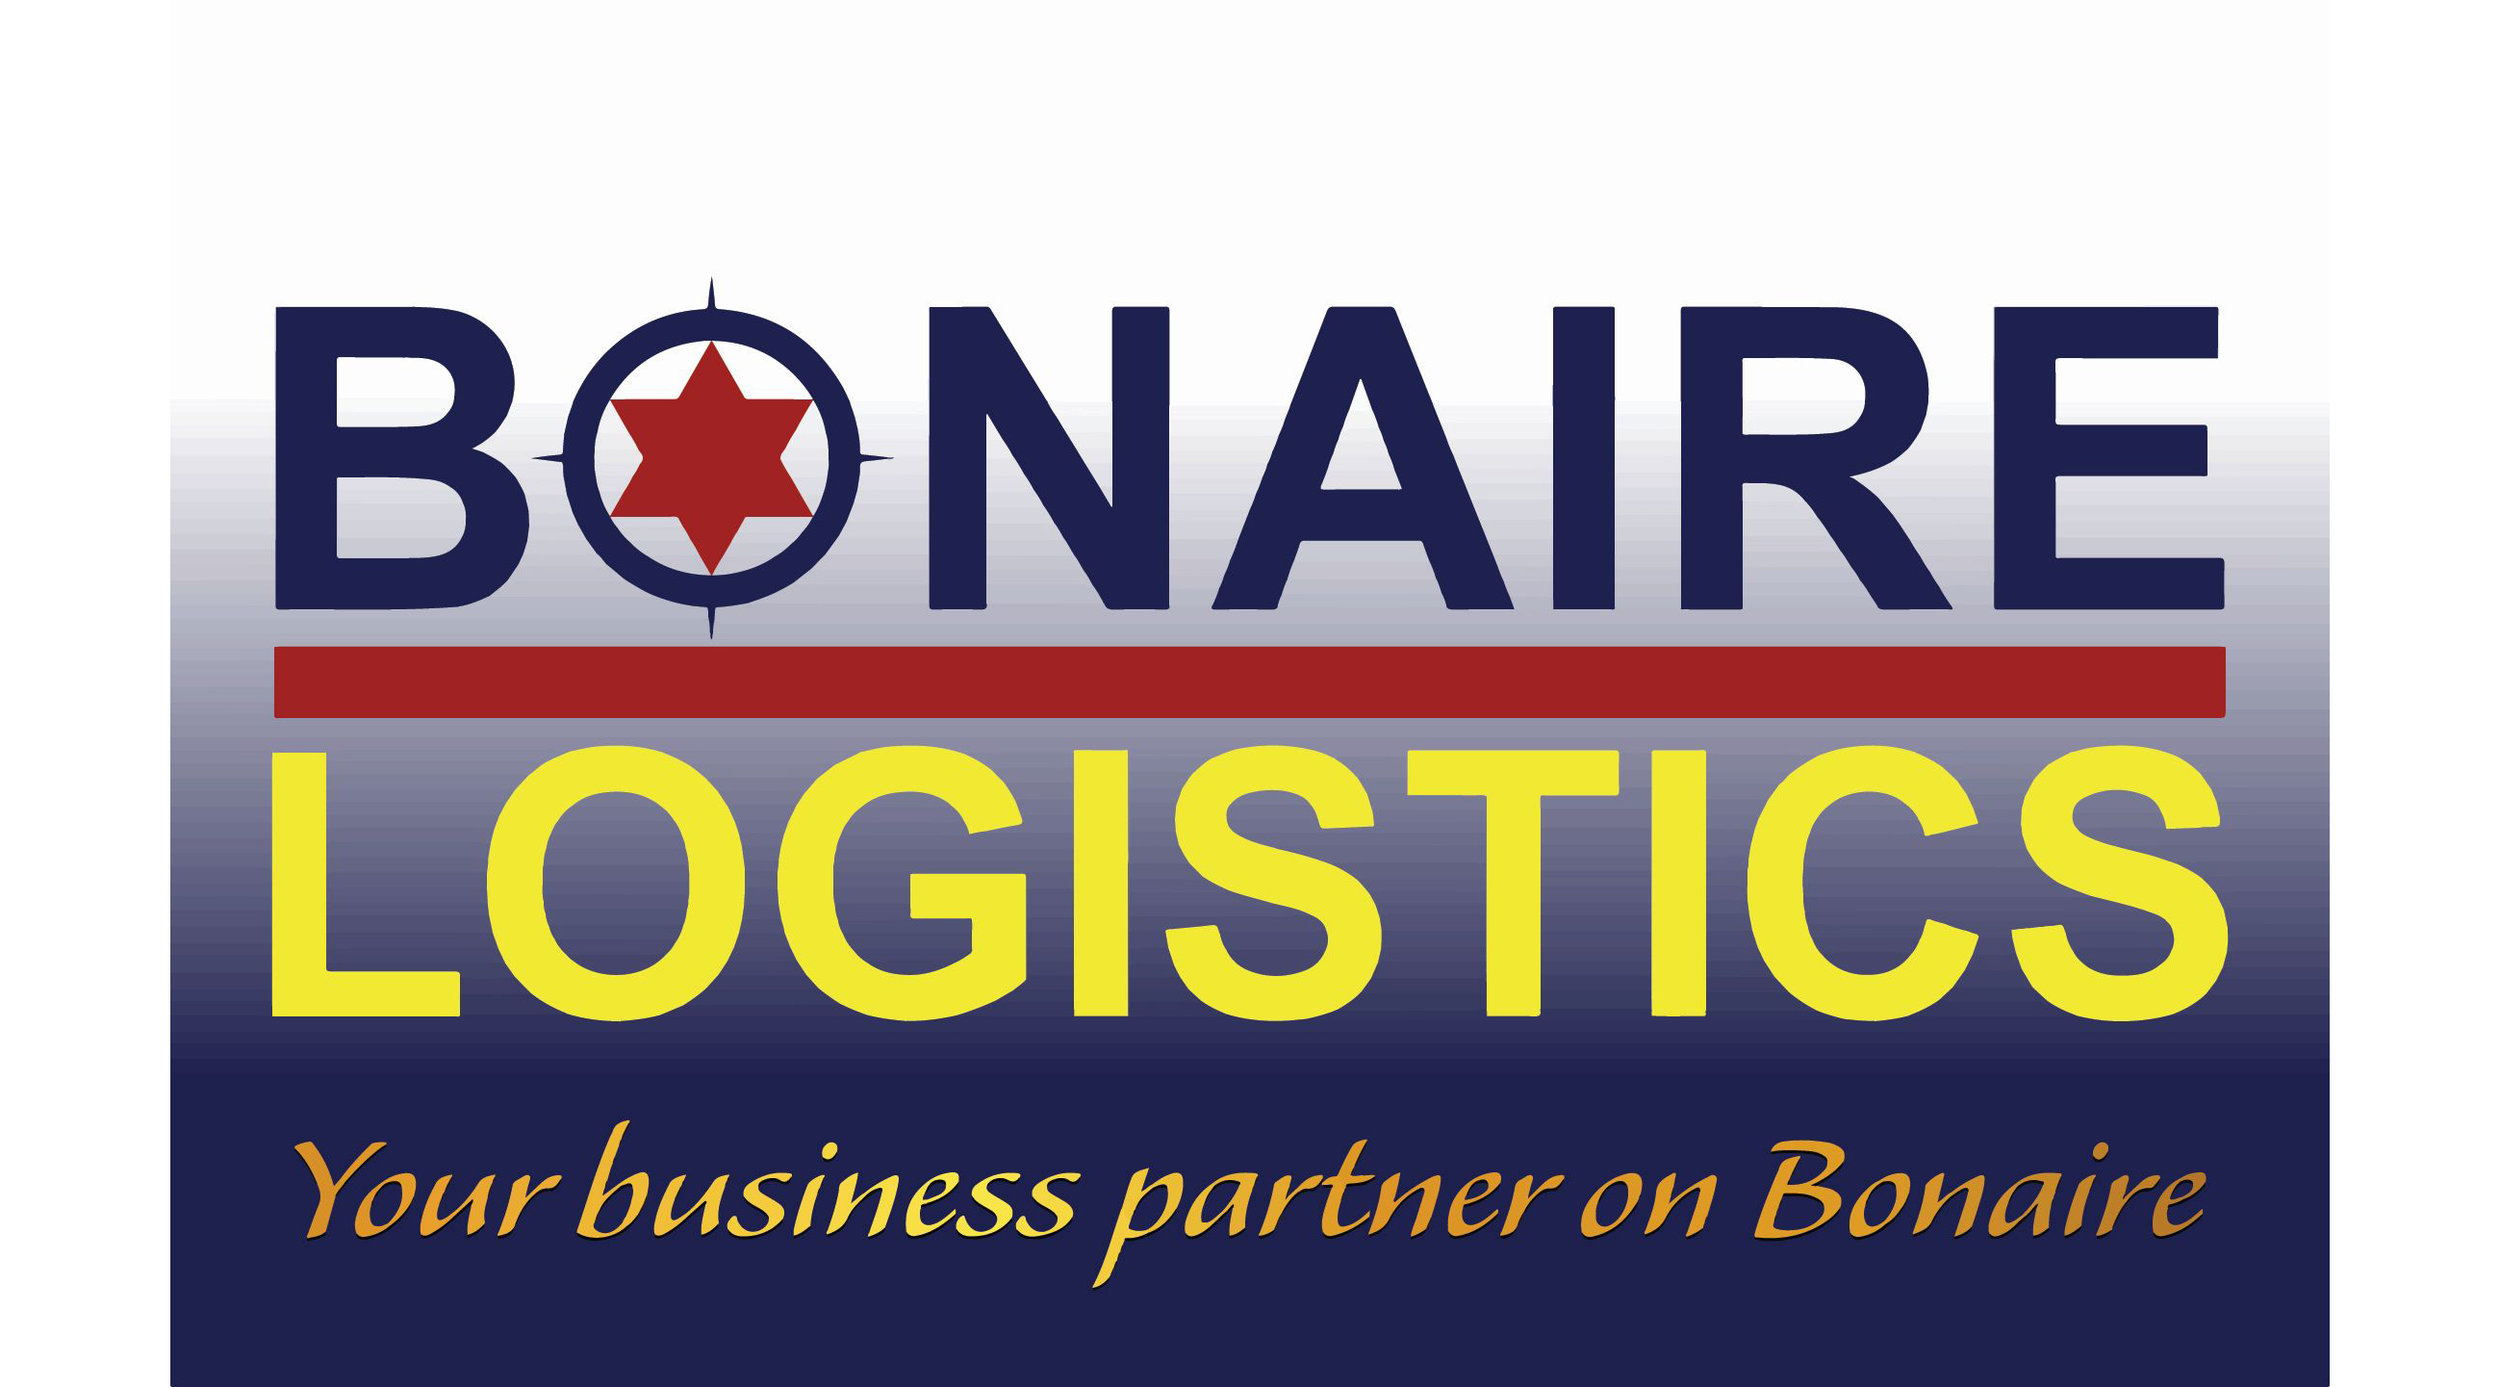 Bonaire Logisticslogo 2.jpg